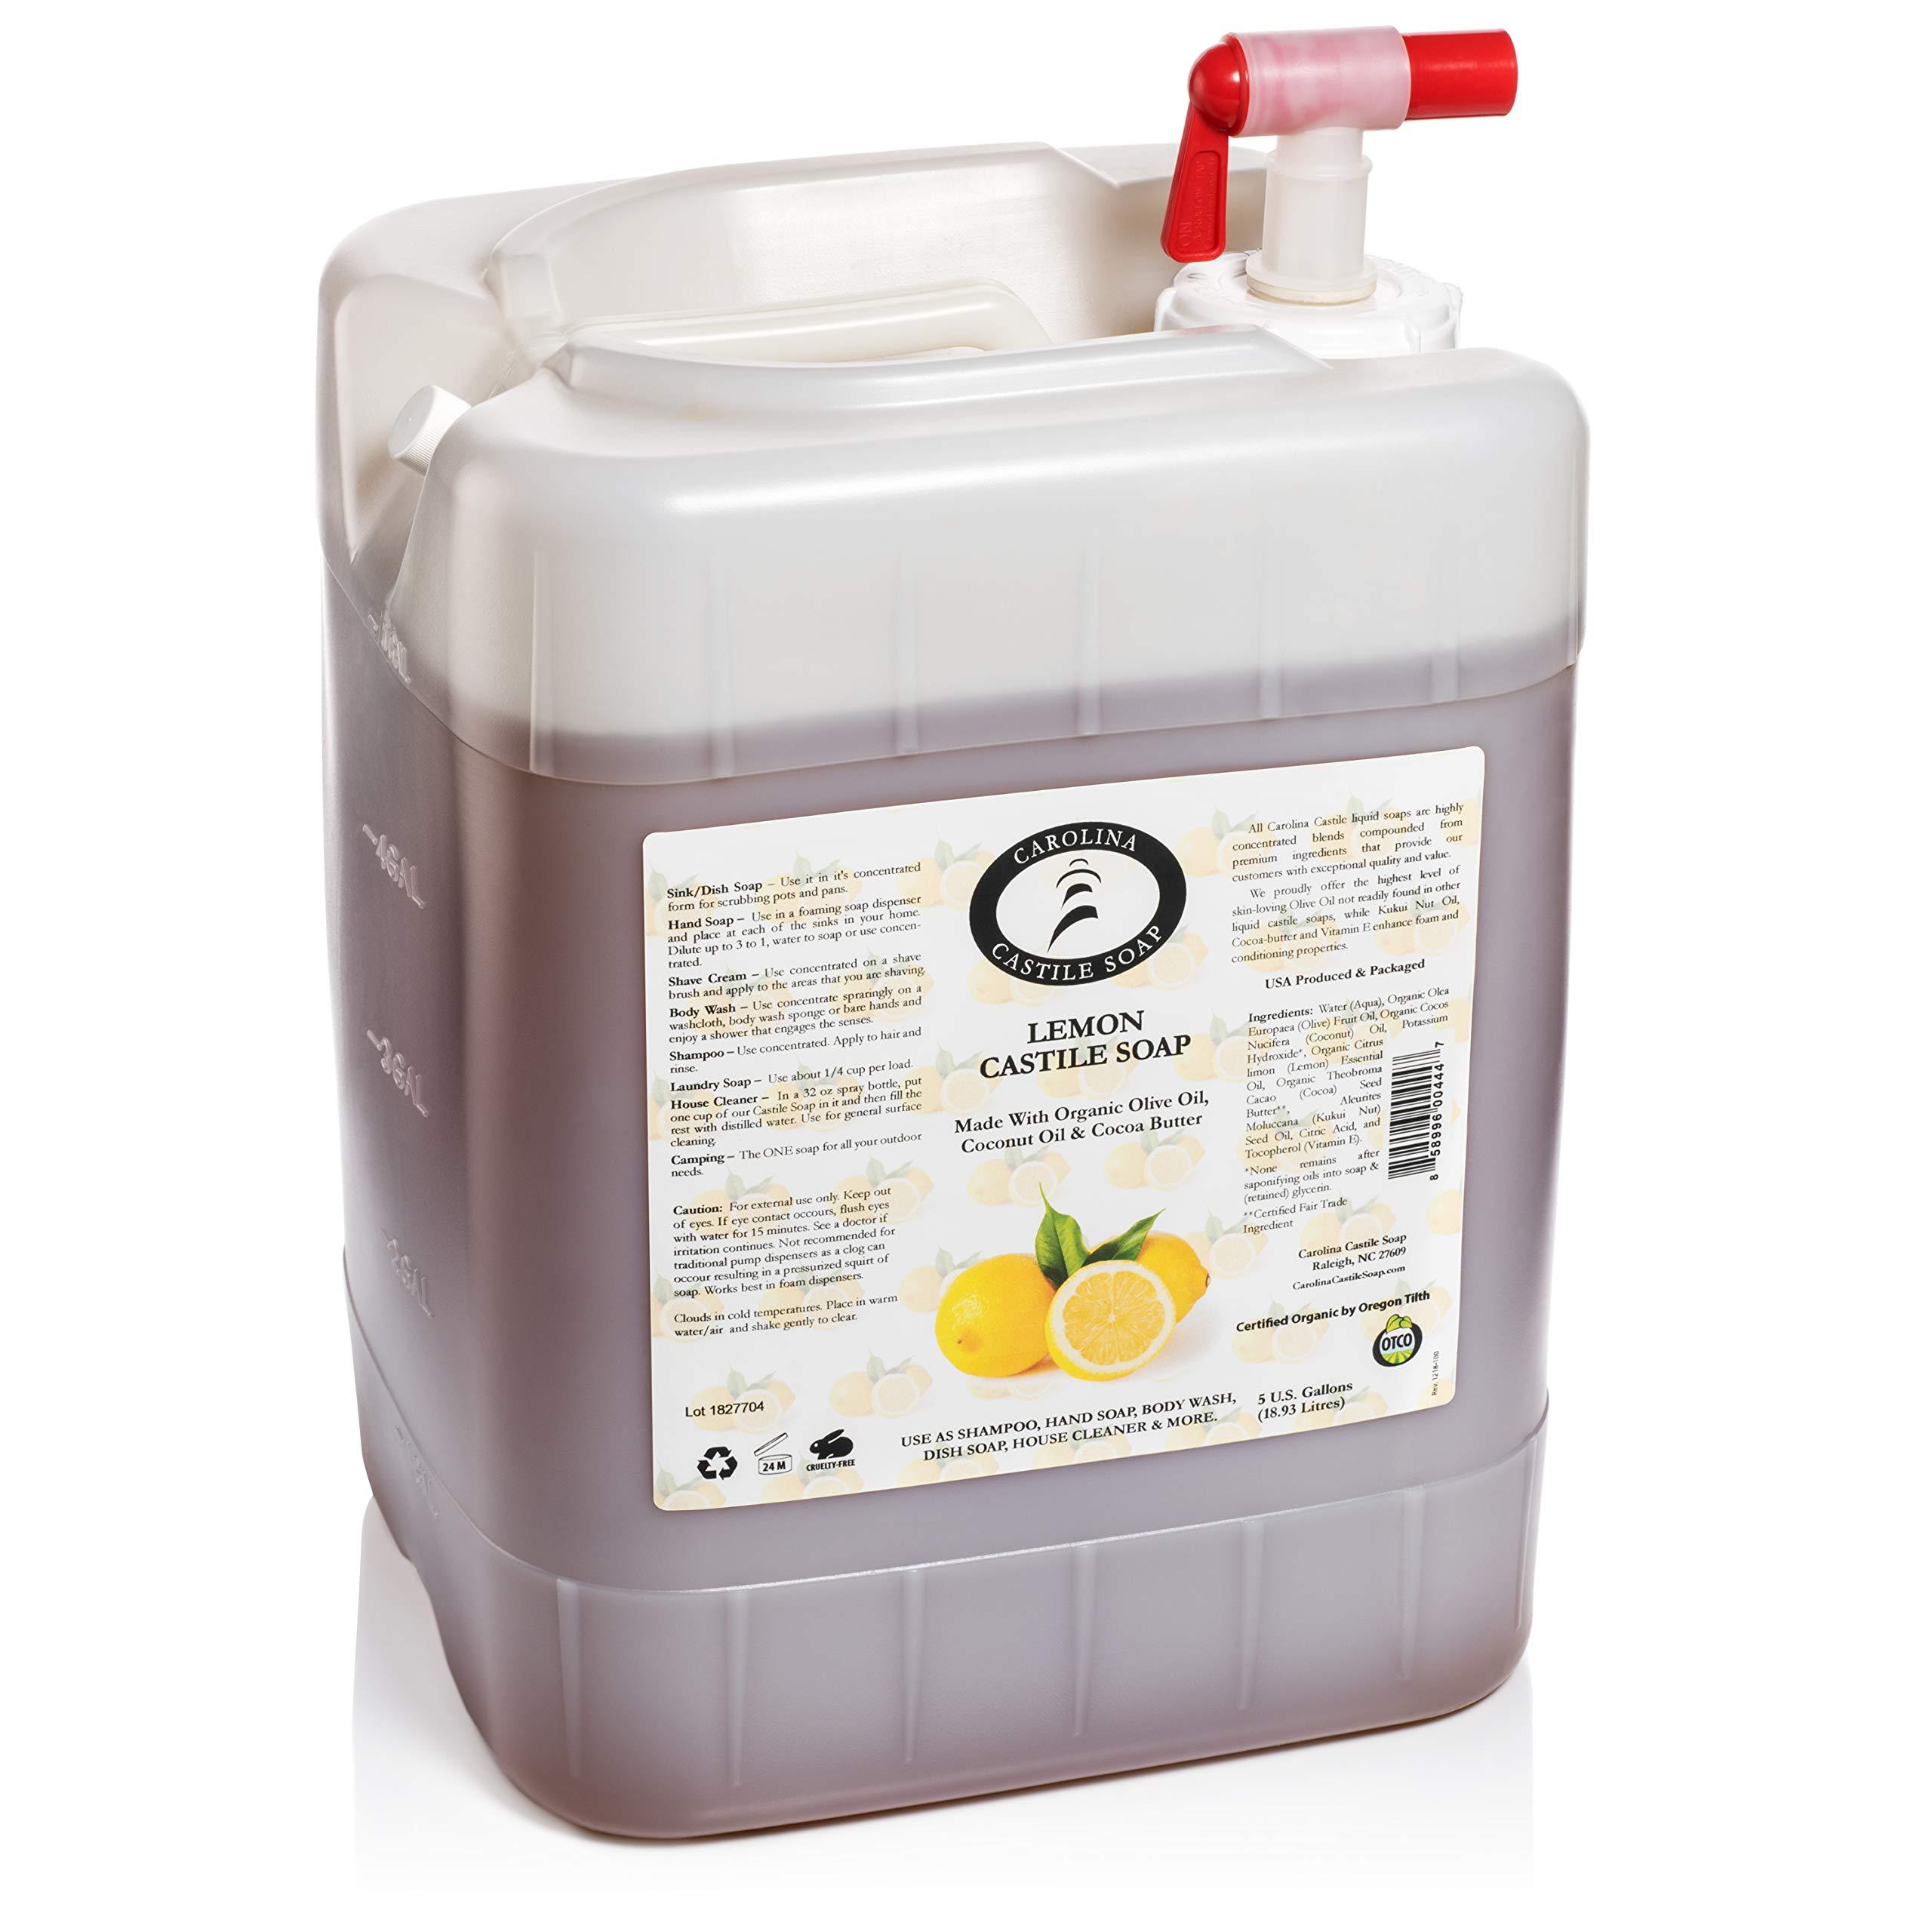 Lemon Castile Soap (5 Gallon Jug)